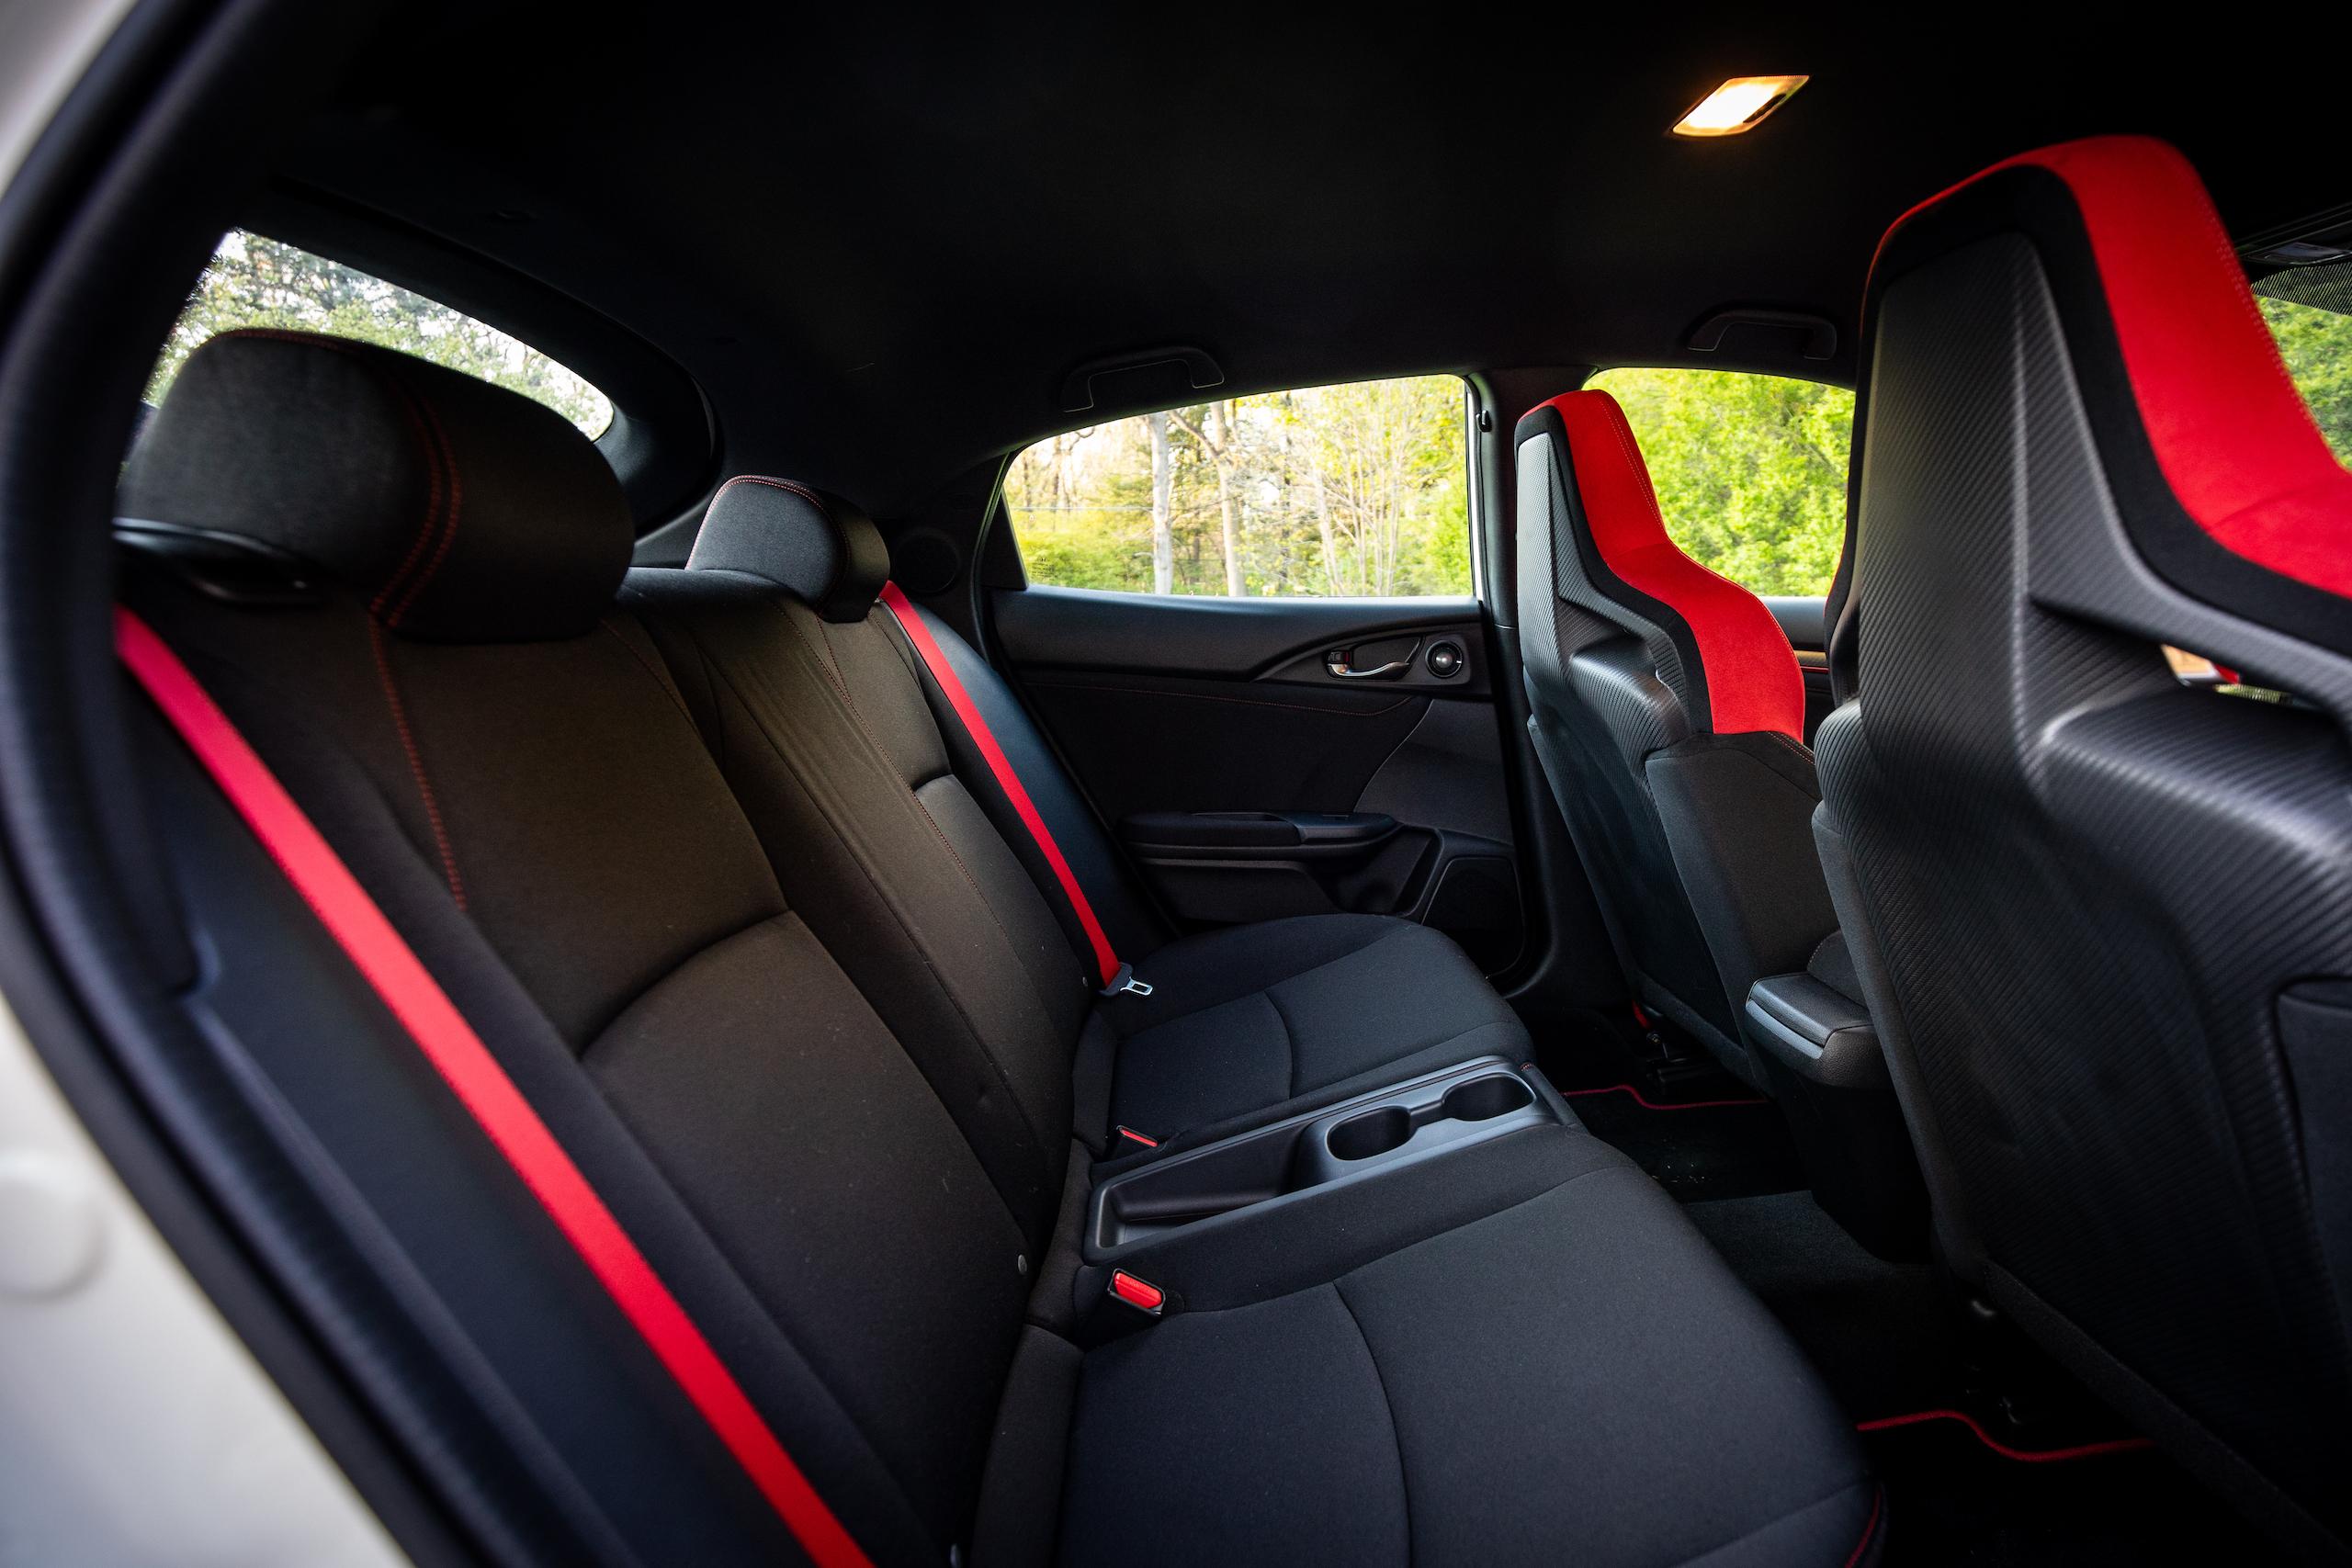 2020 Honda Civic Type R interior back seat